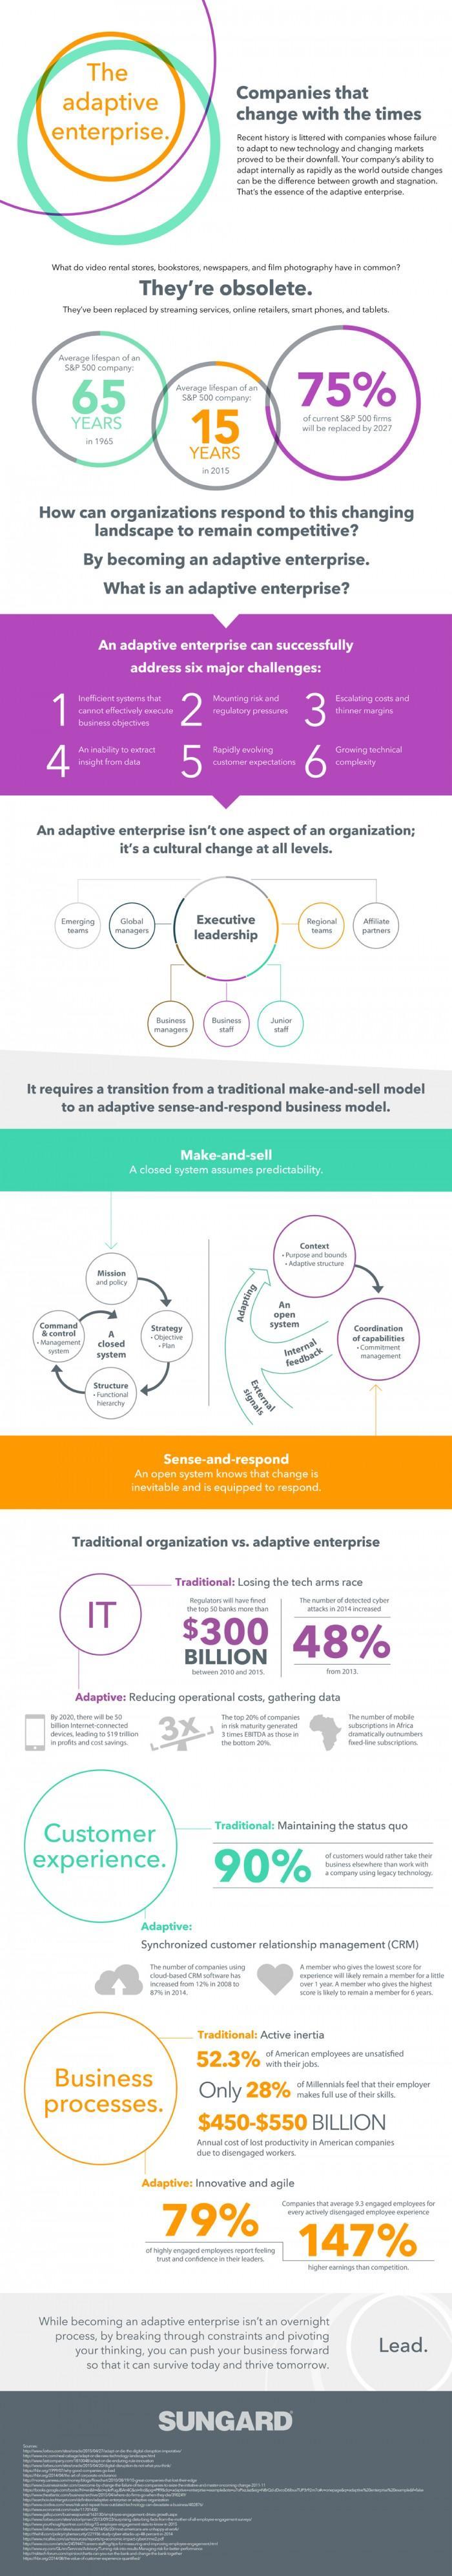 AdaptiveEnterprise_Infographic